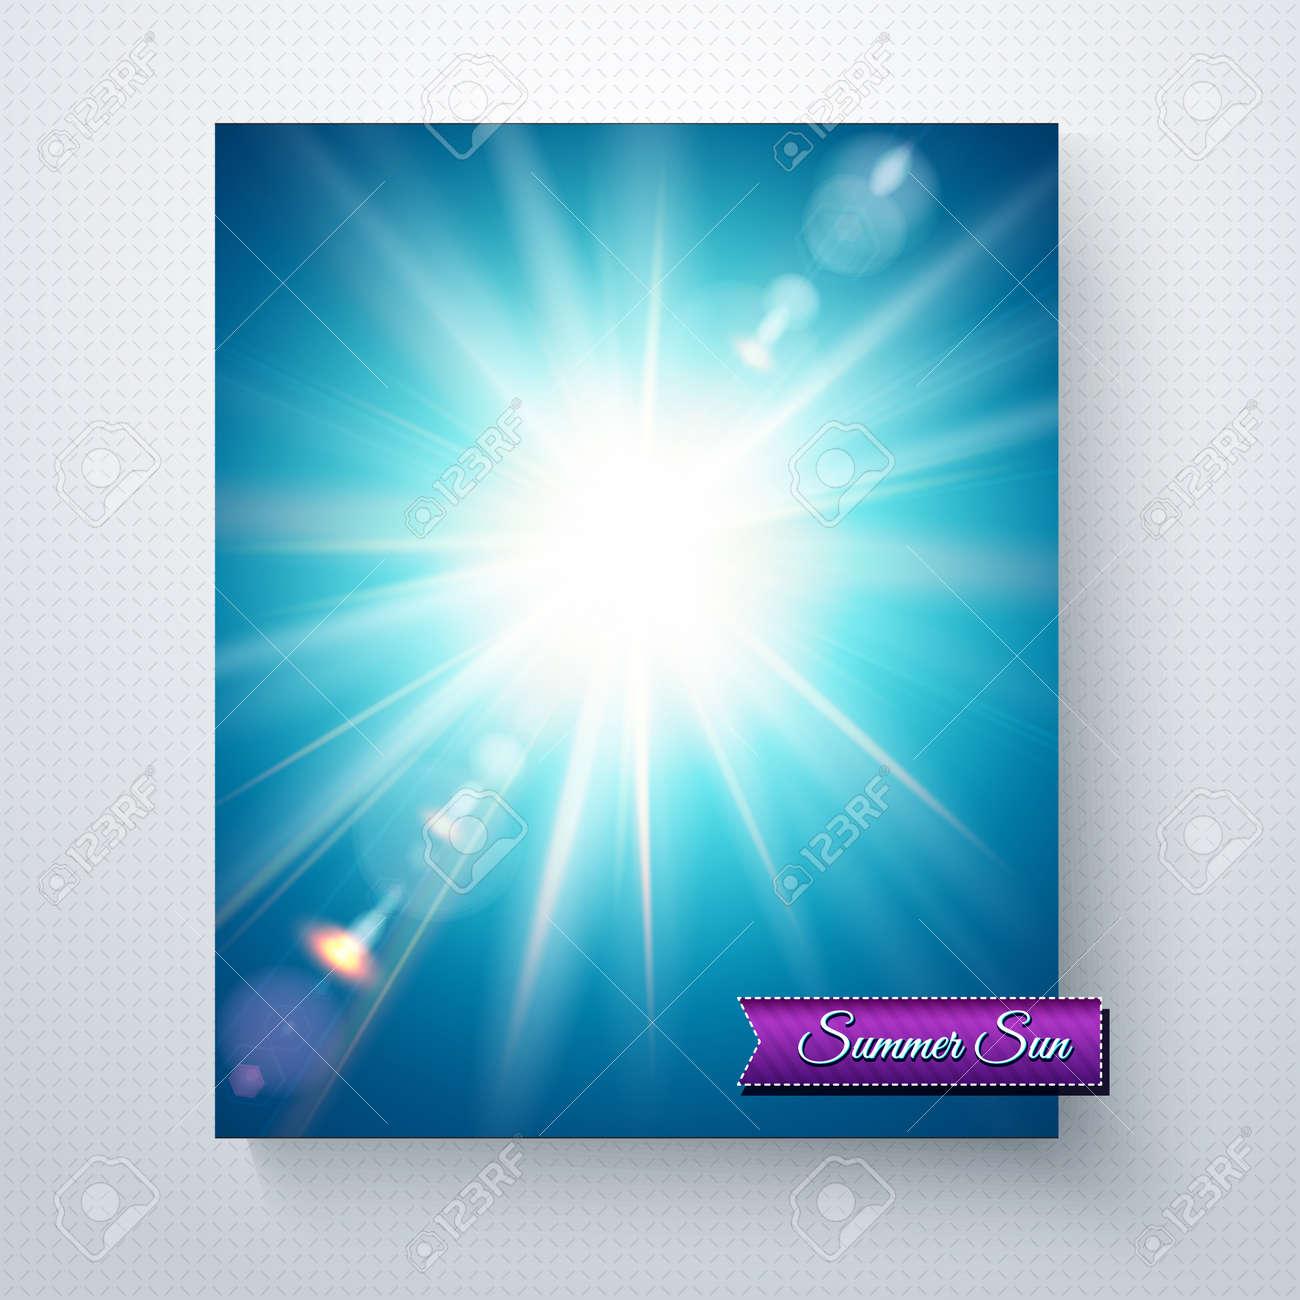 bright white sunburst in a blue summer sky with sun flare and rh 123rf com Vector Light Flare Yellow Sun Clip Art